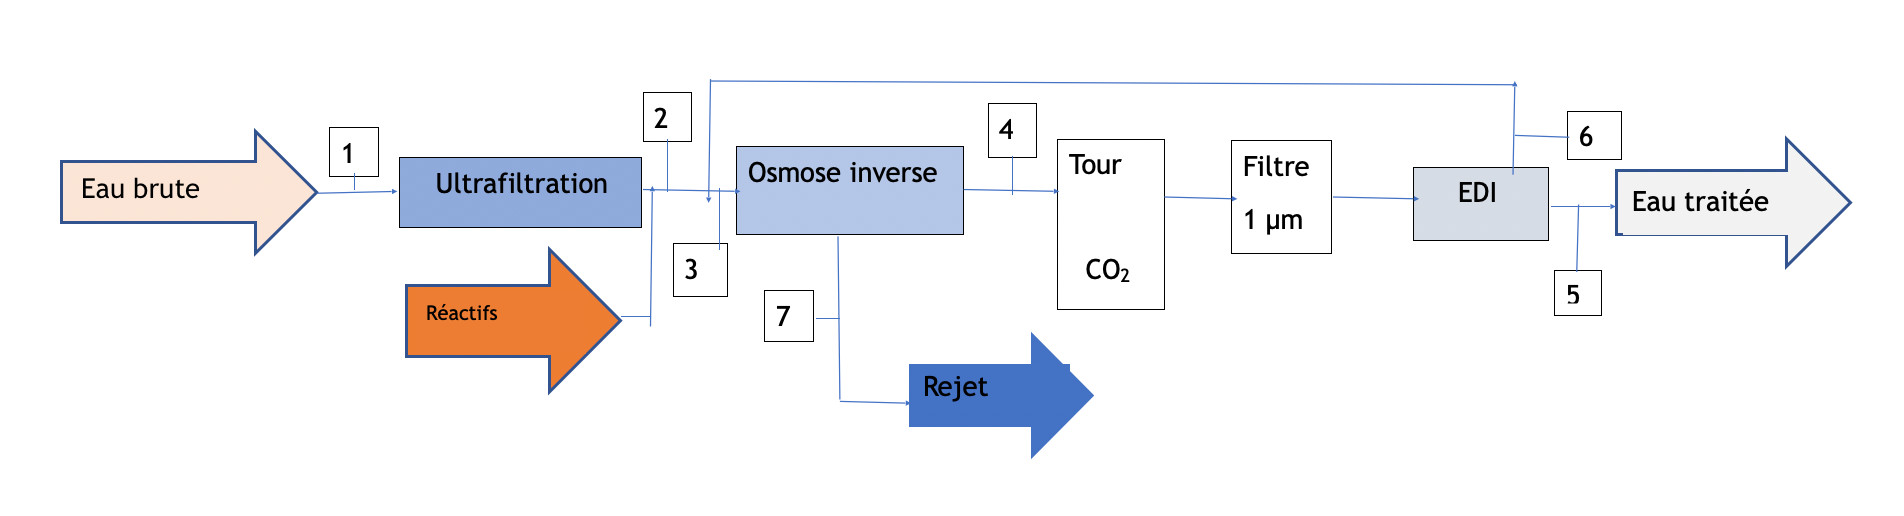 edi-diagram-2-fr